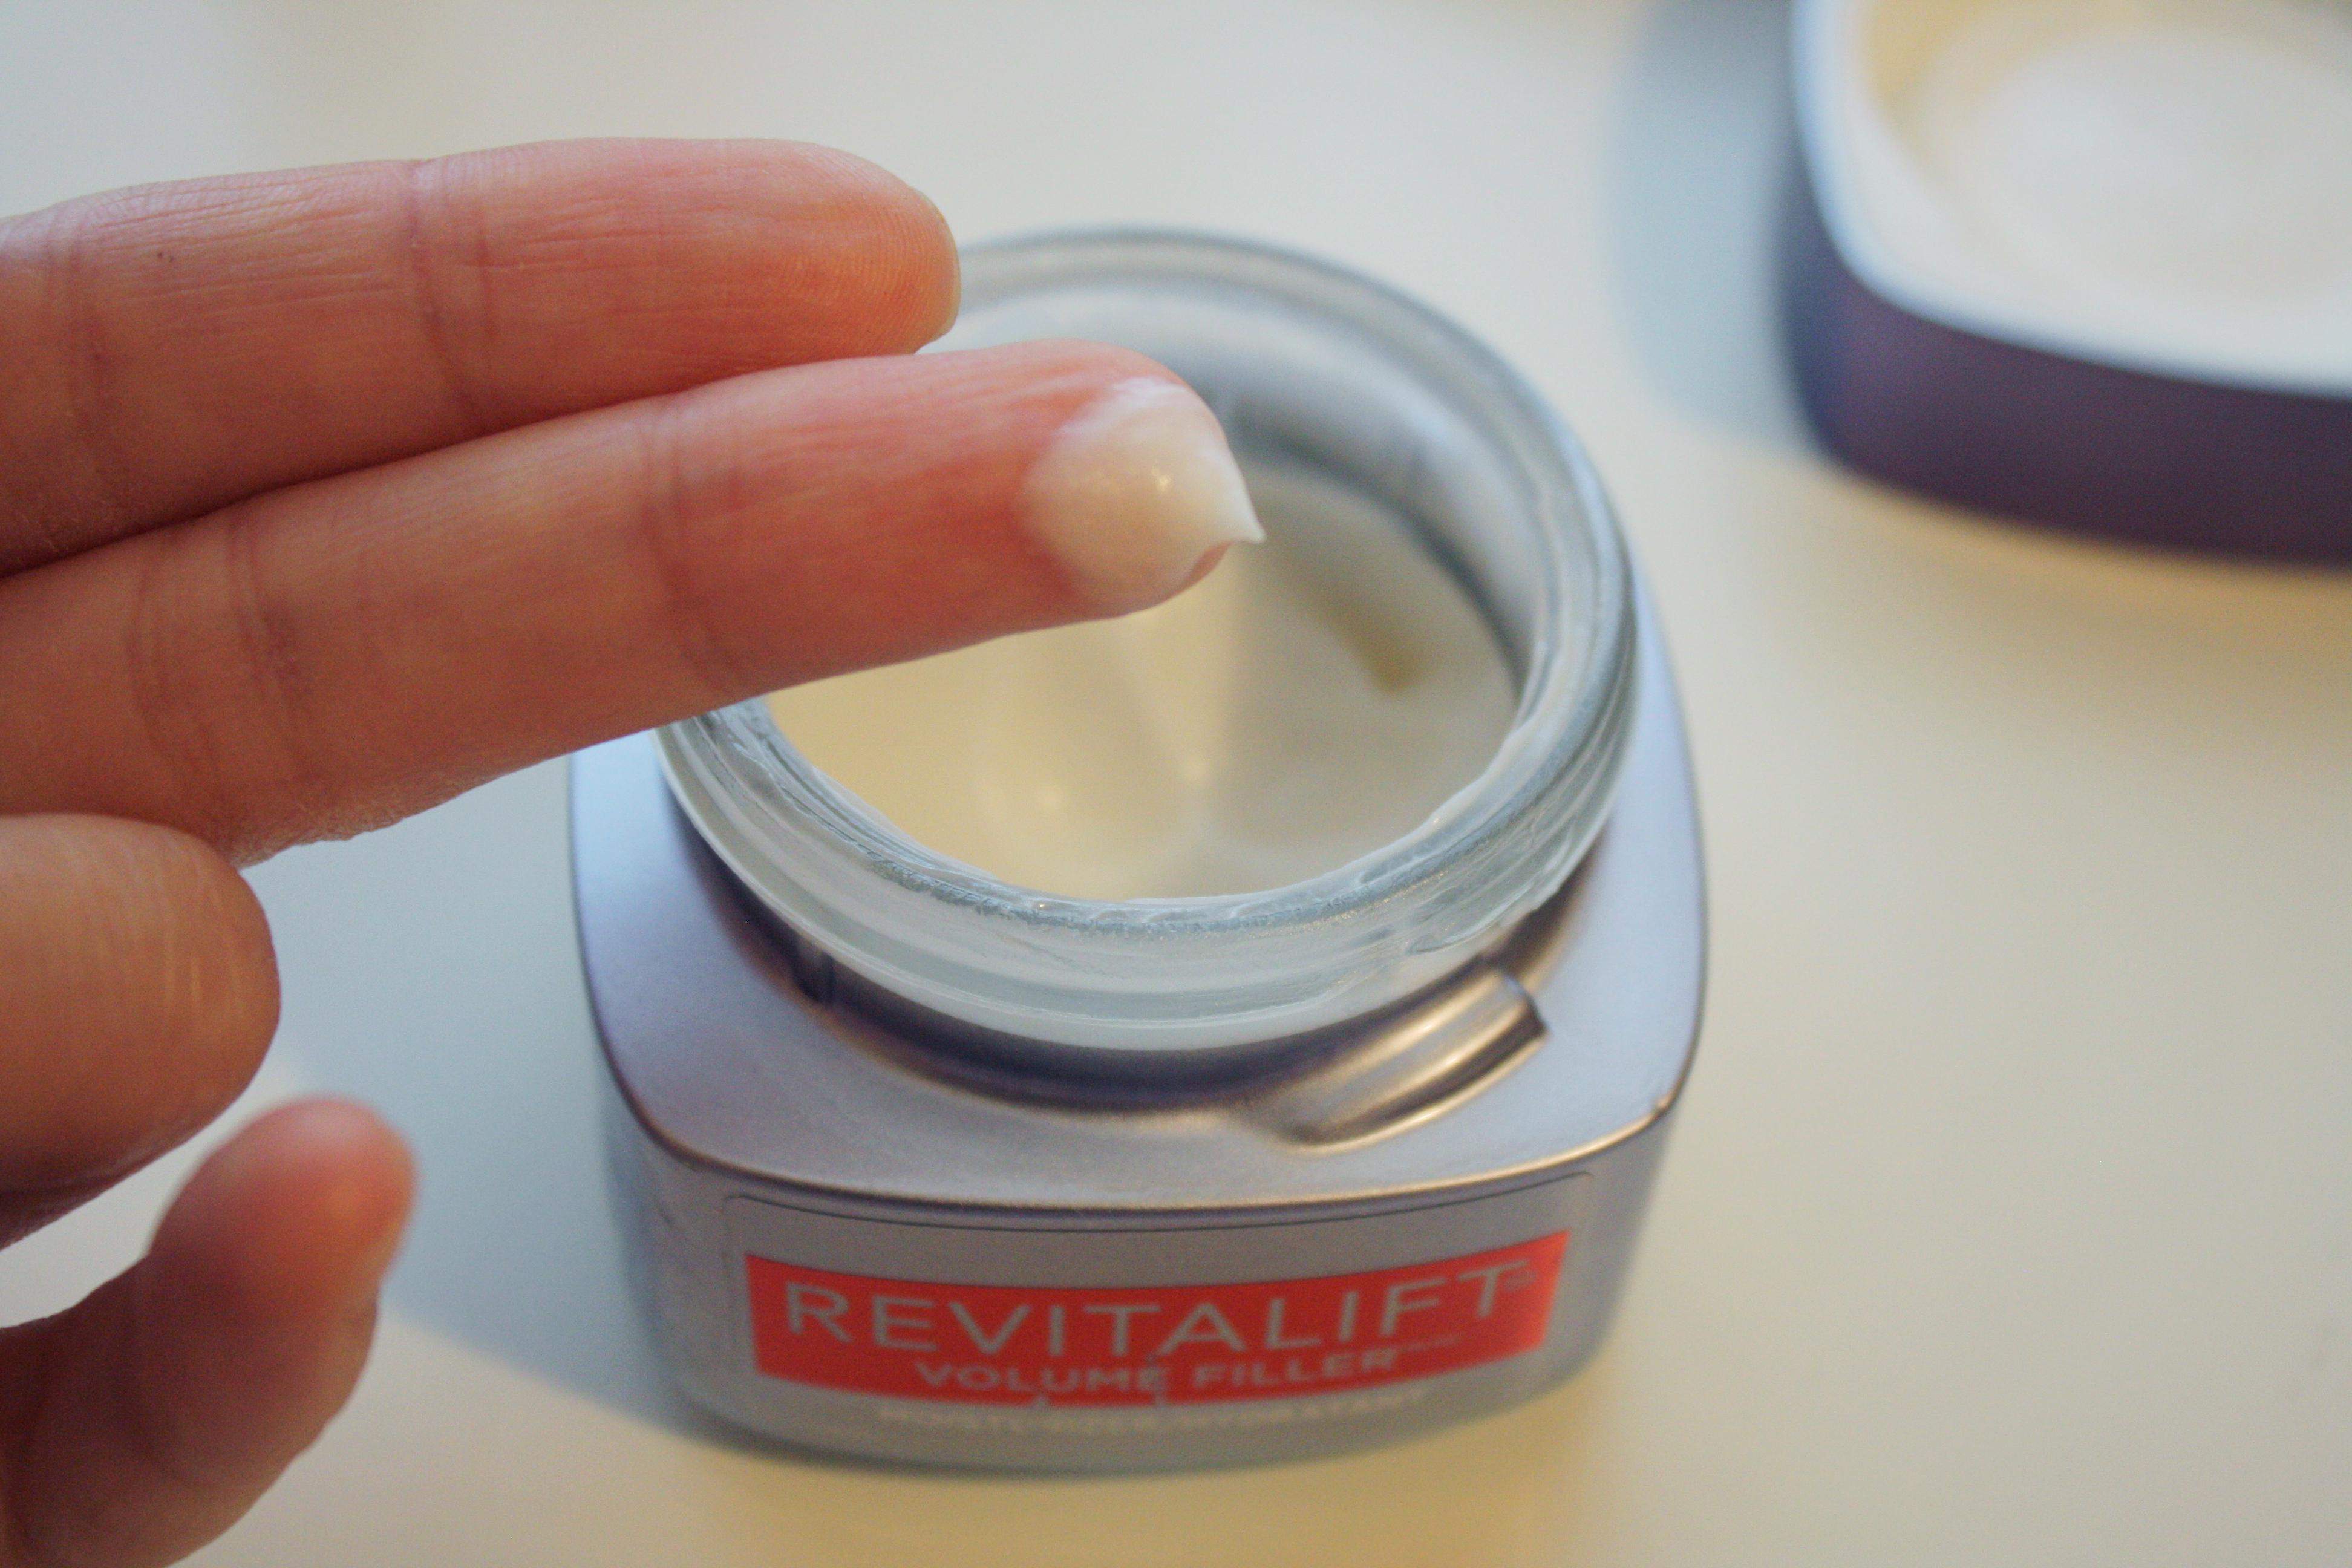 l'oreal revitalift volume filler line skincare hyaluronic acid review daily volumizing moisturizer anti-aging mature skin